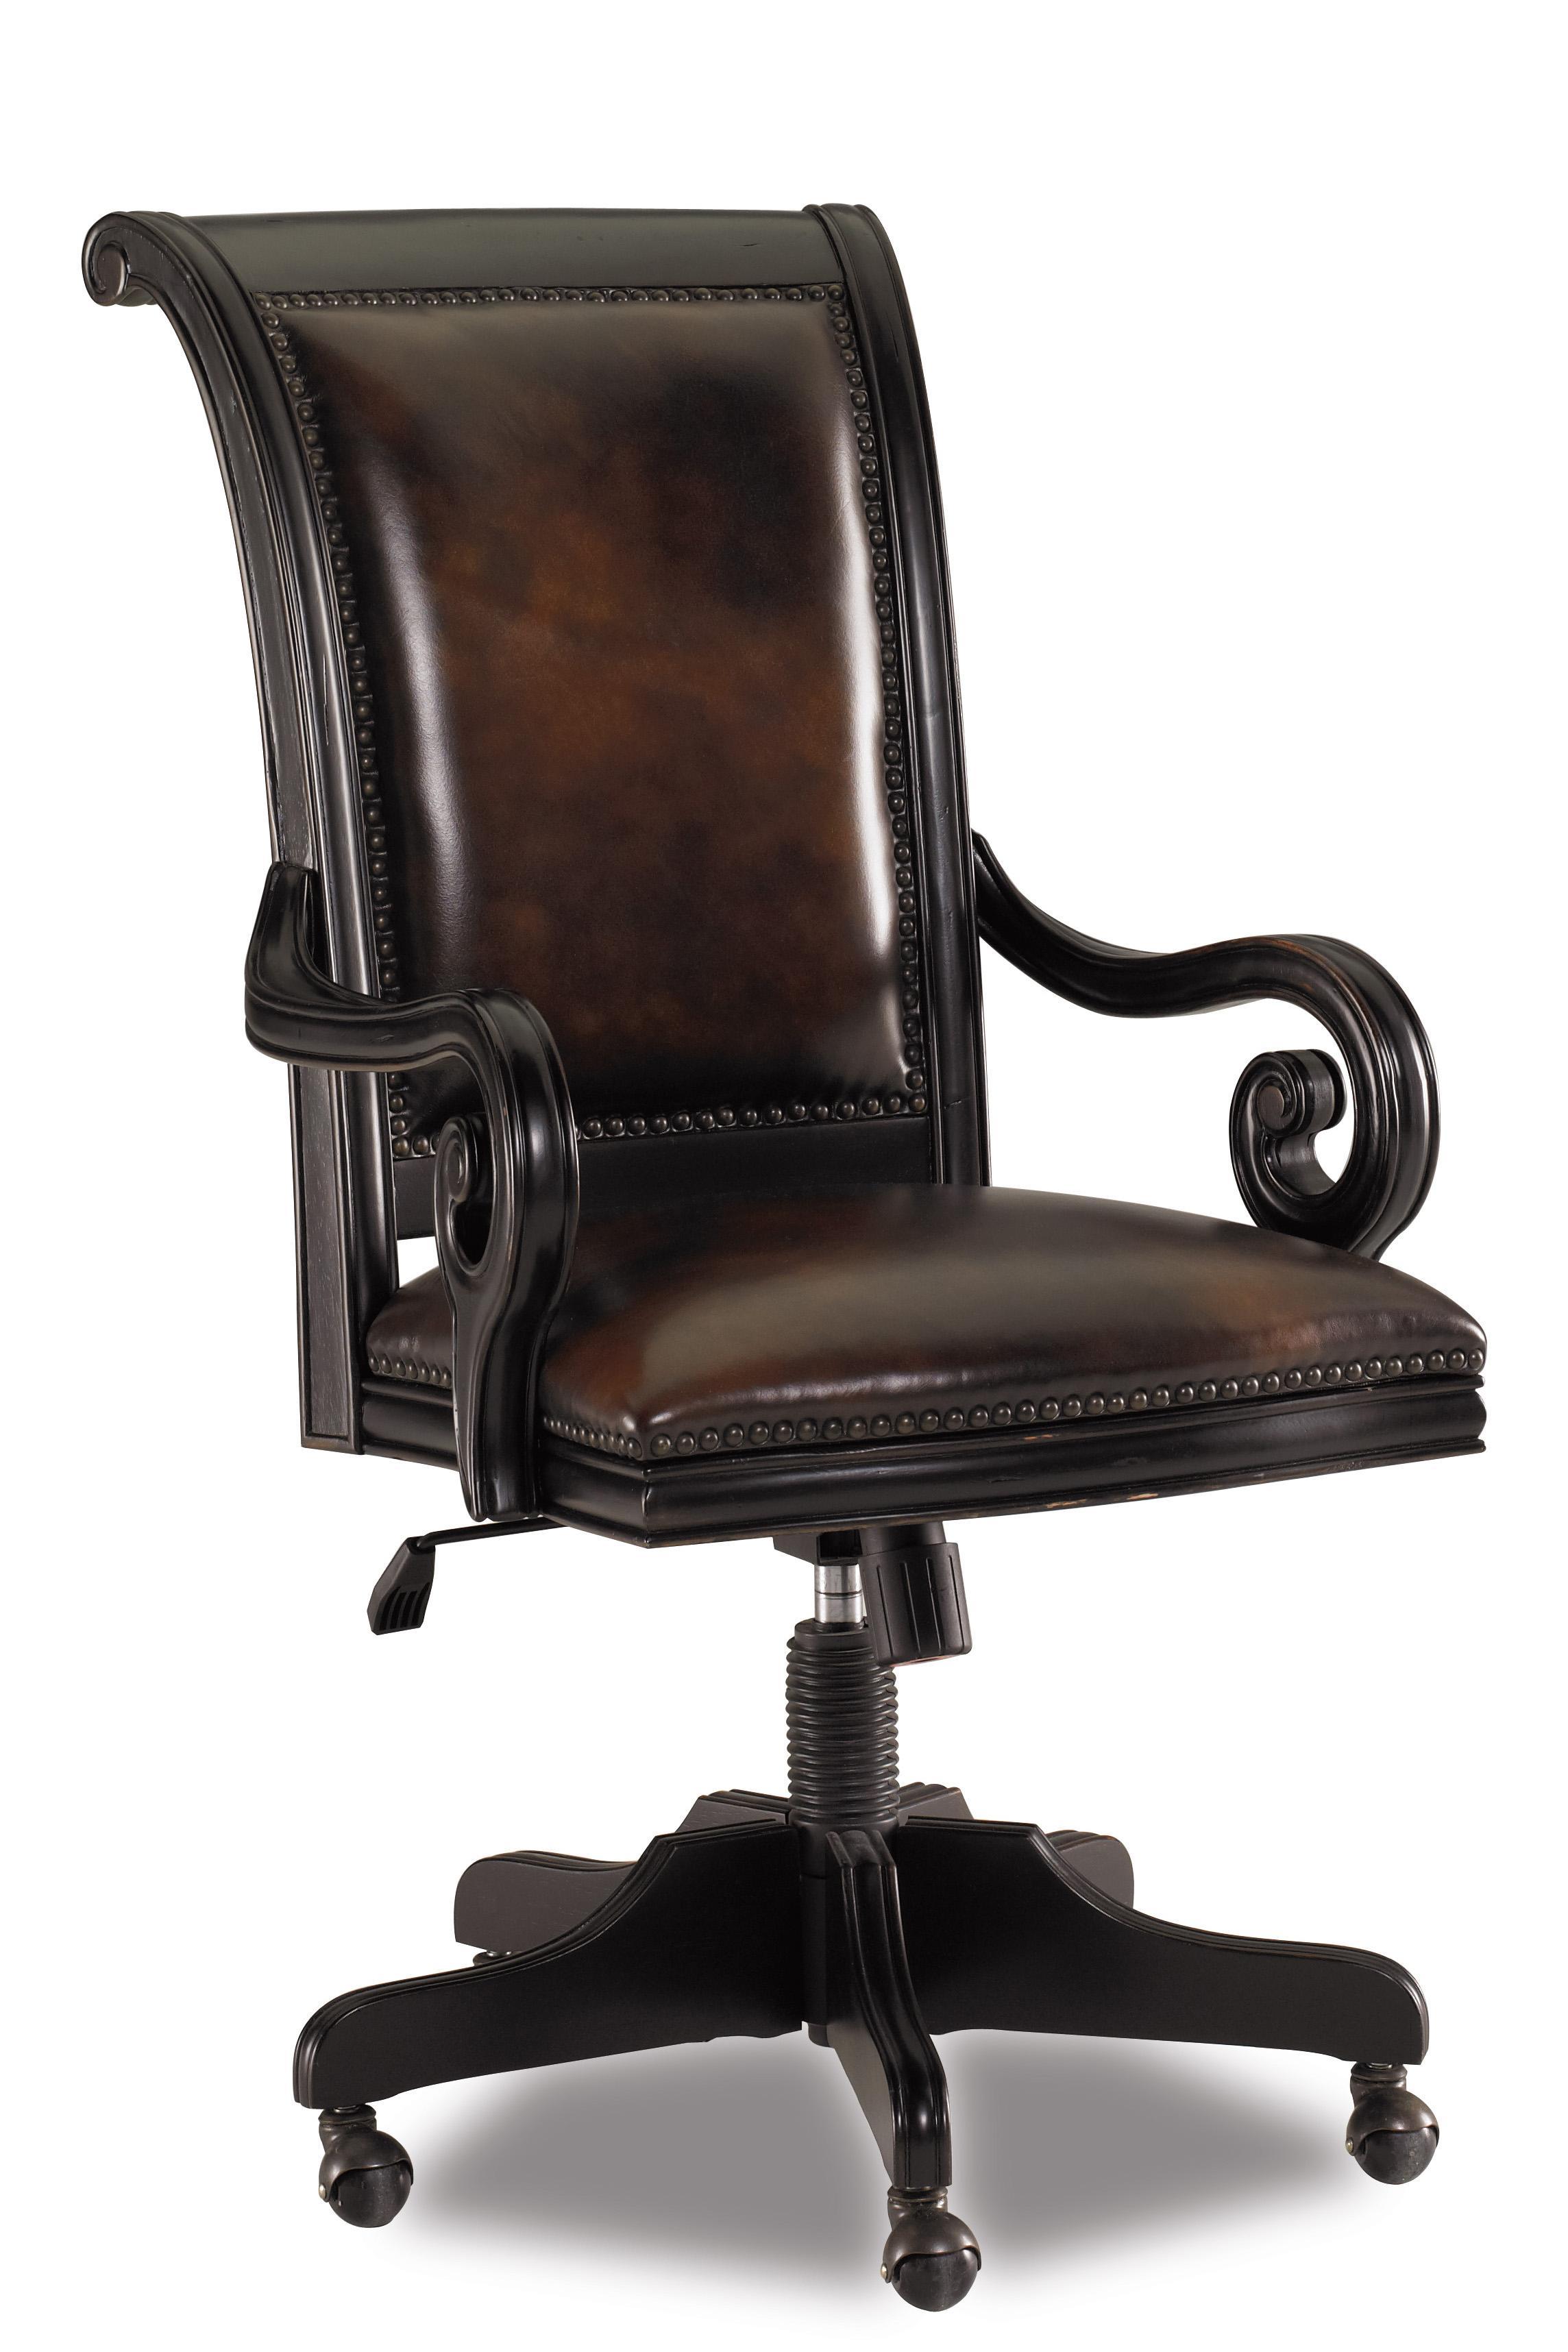 Telluride Tilt Swivel Chair by Hooker Furniture at Mueller Furniture